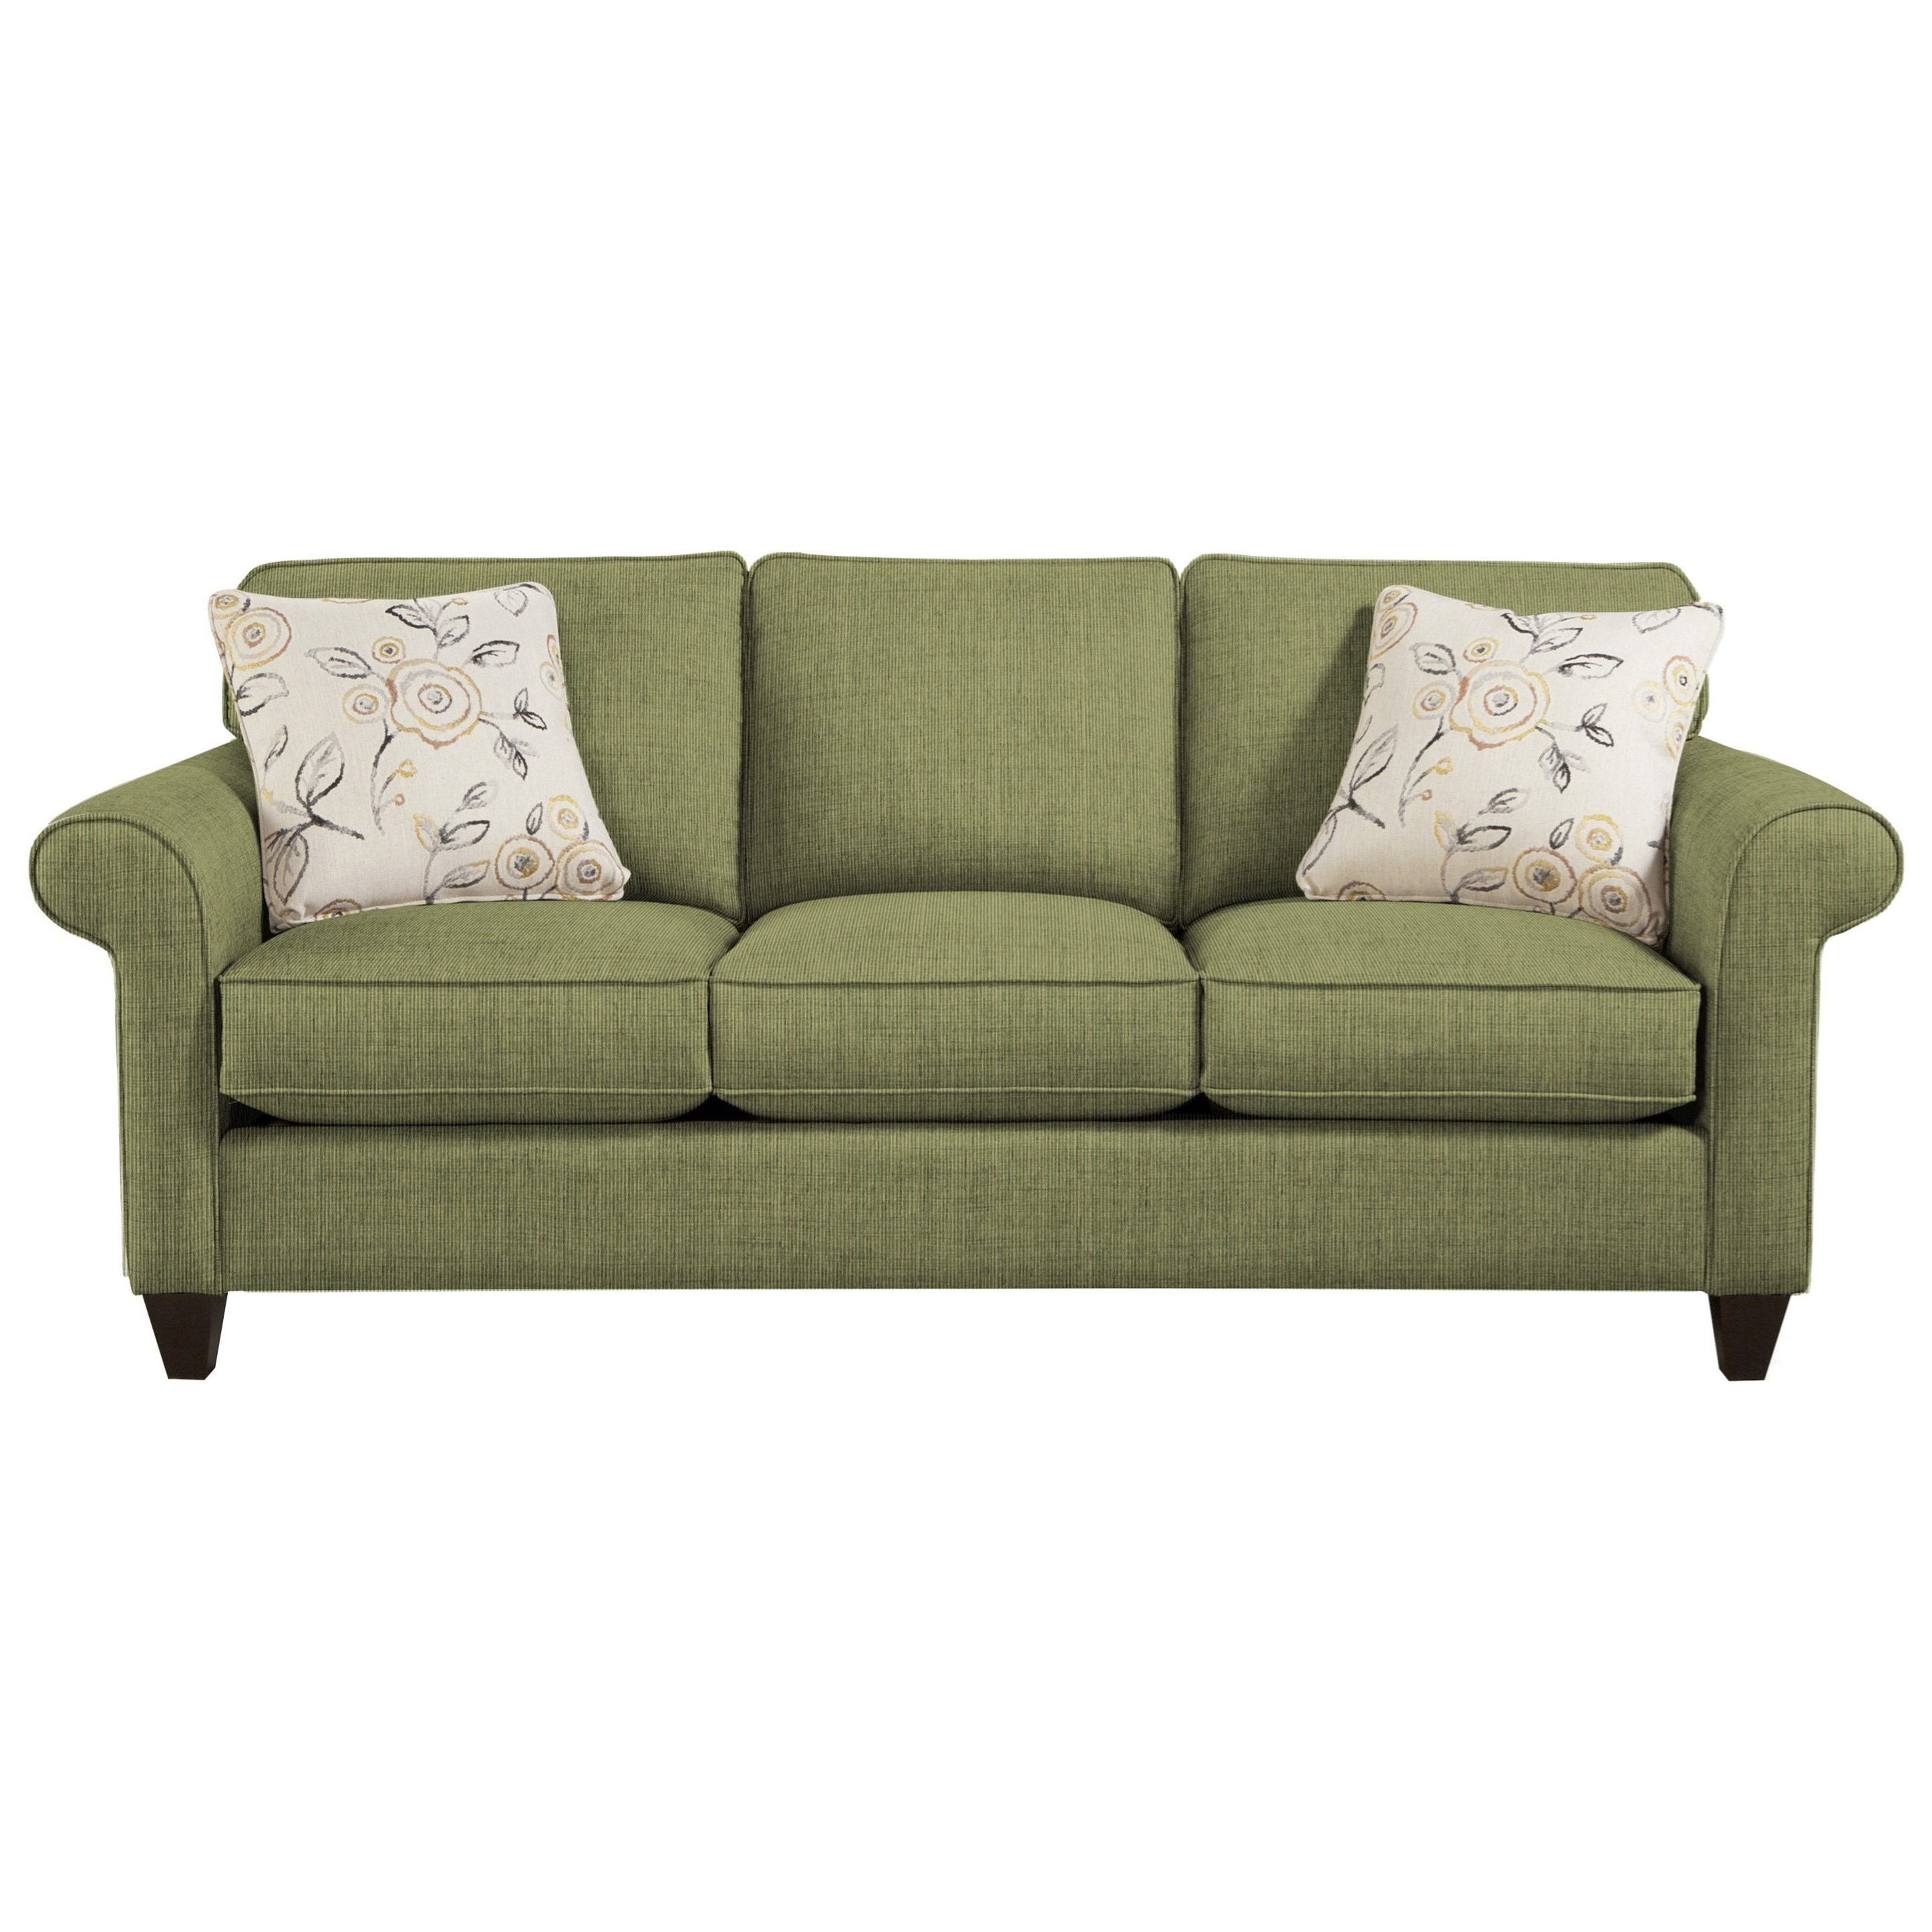 7421 Sofa by Craftmaster at Dean Bosler's